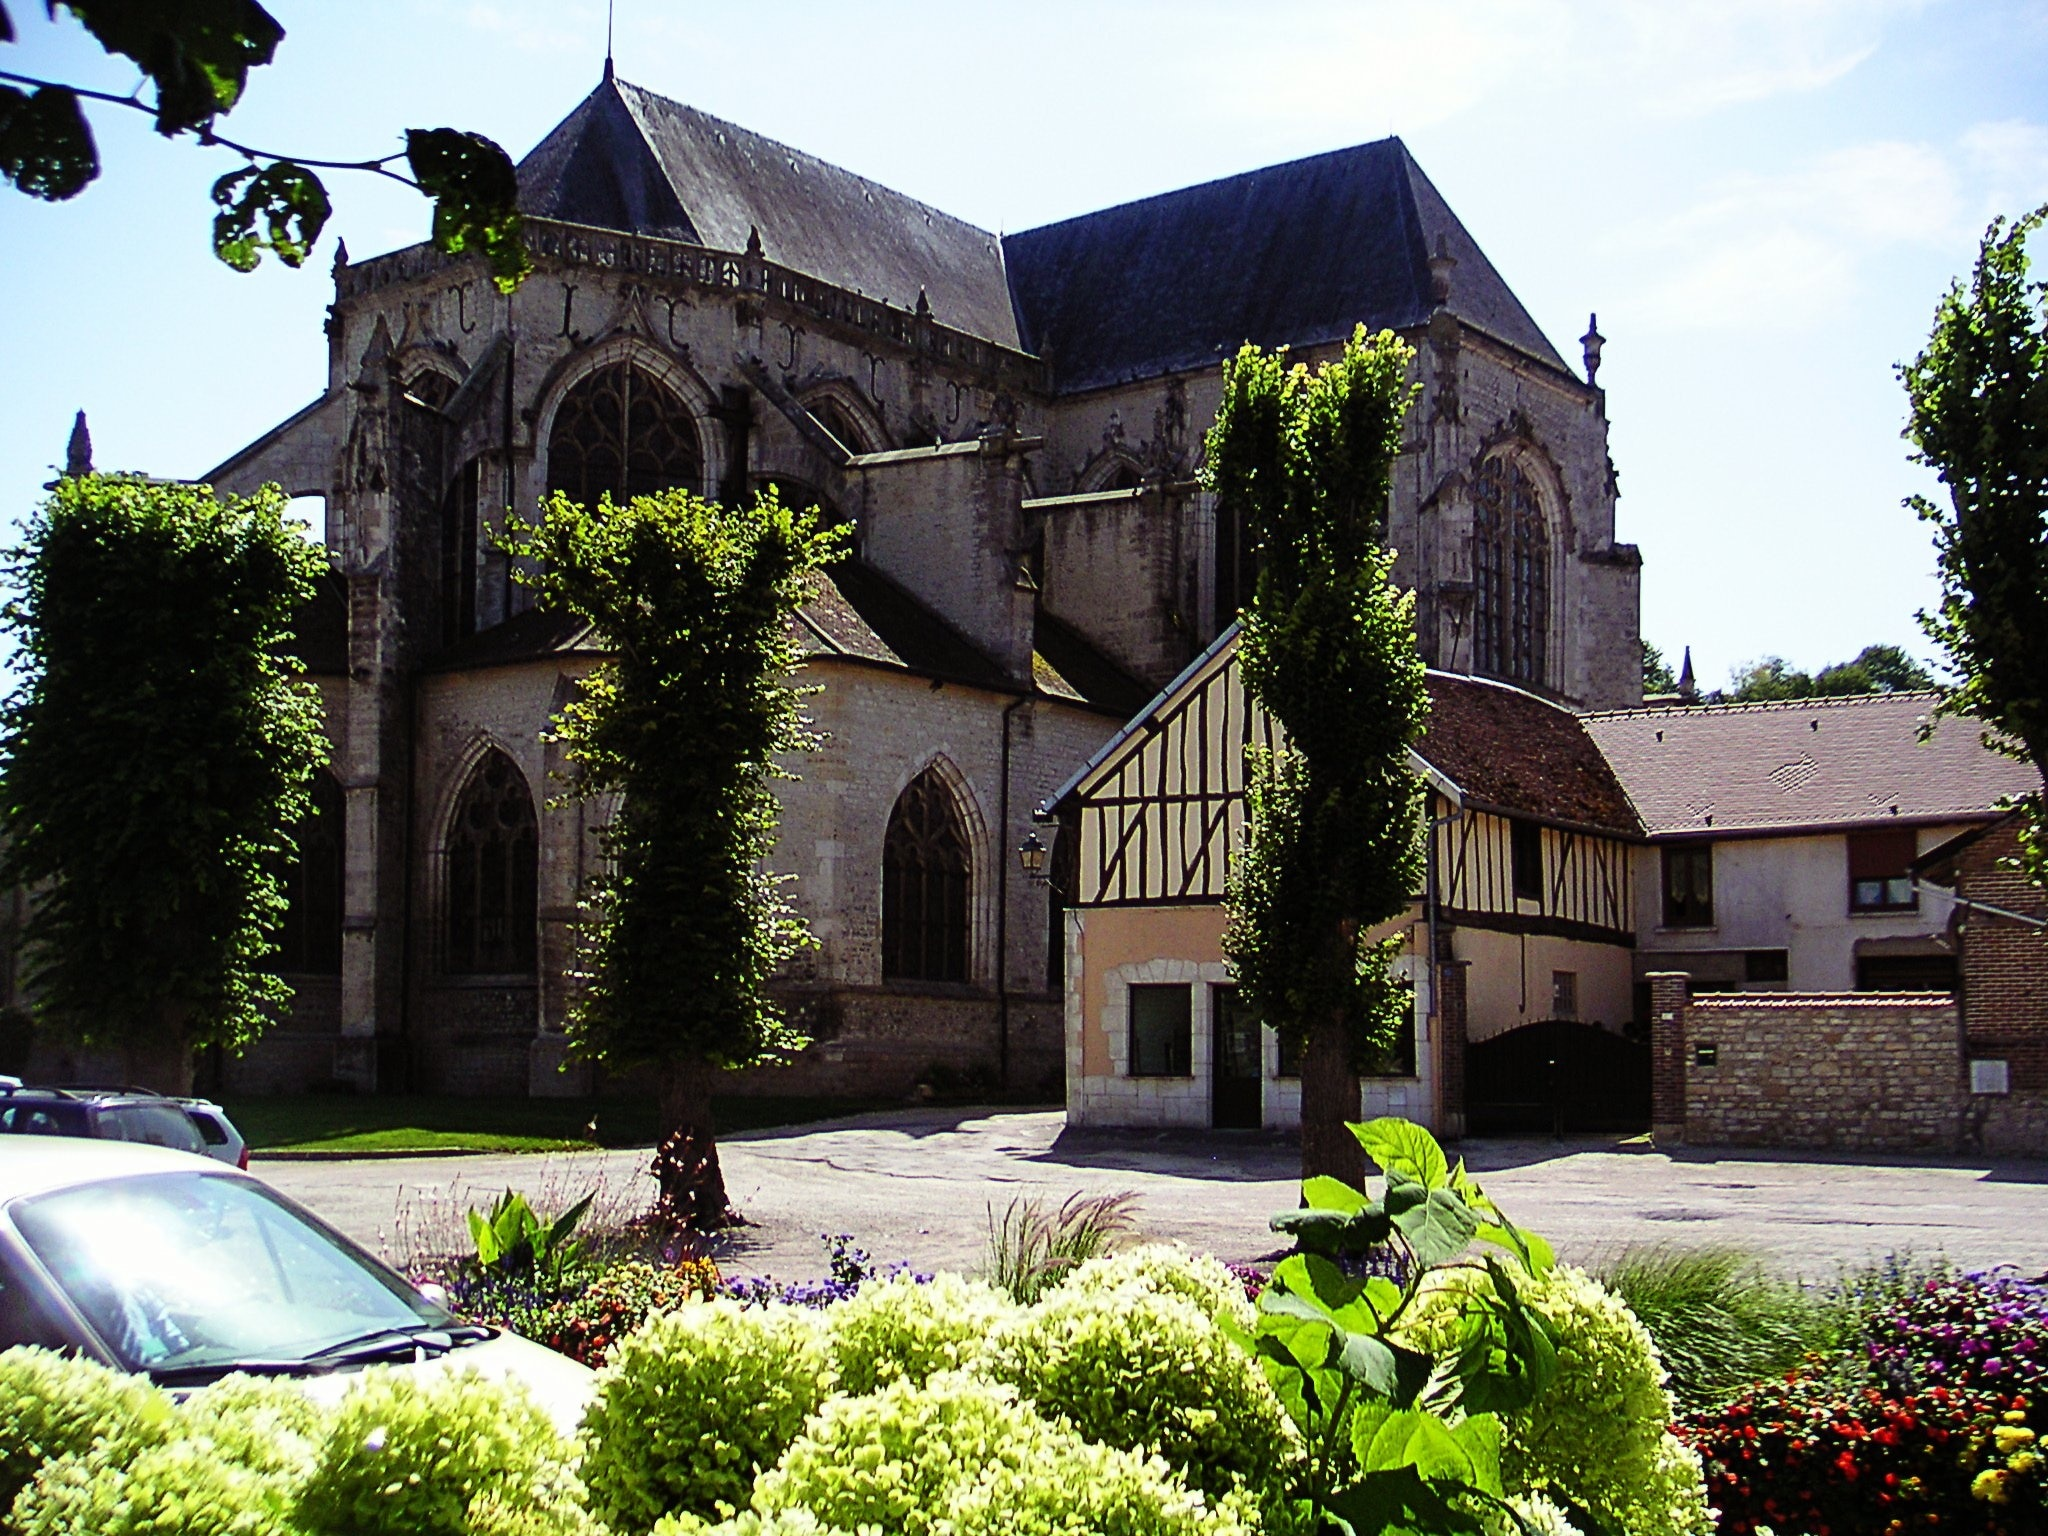 Bar-sur-Seine, Aube, France